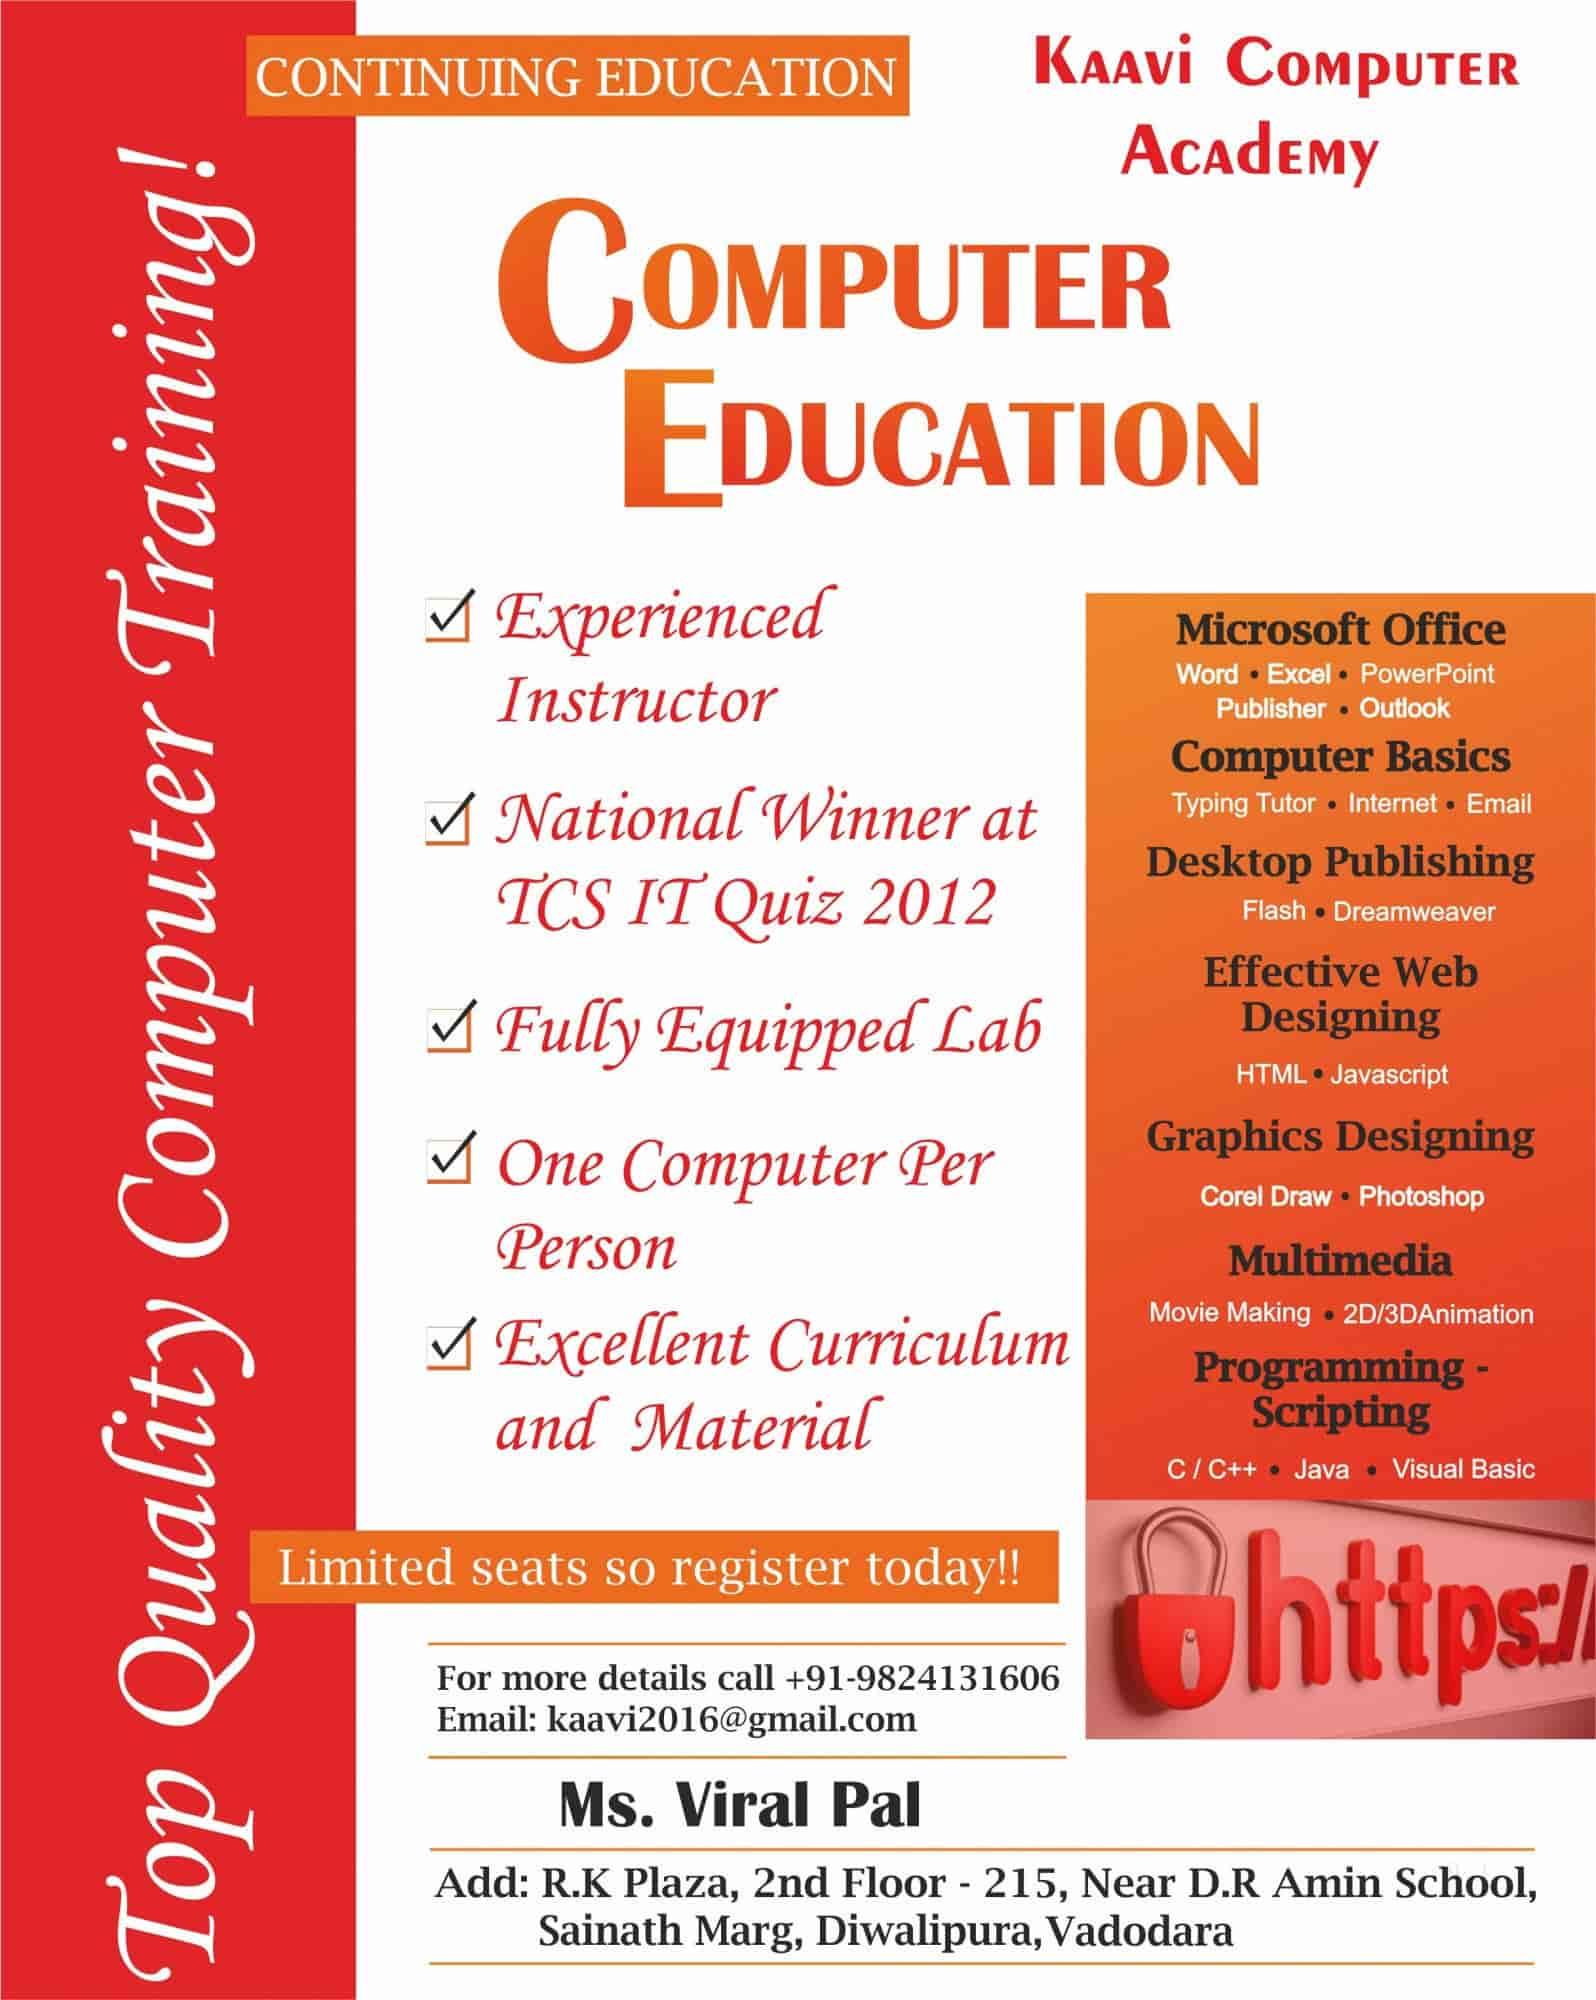 Kaavi Computer Academy, Diwalipura - Computer Training